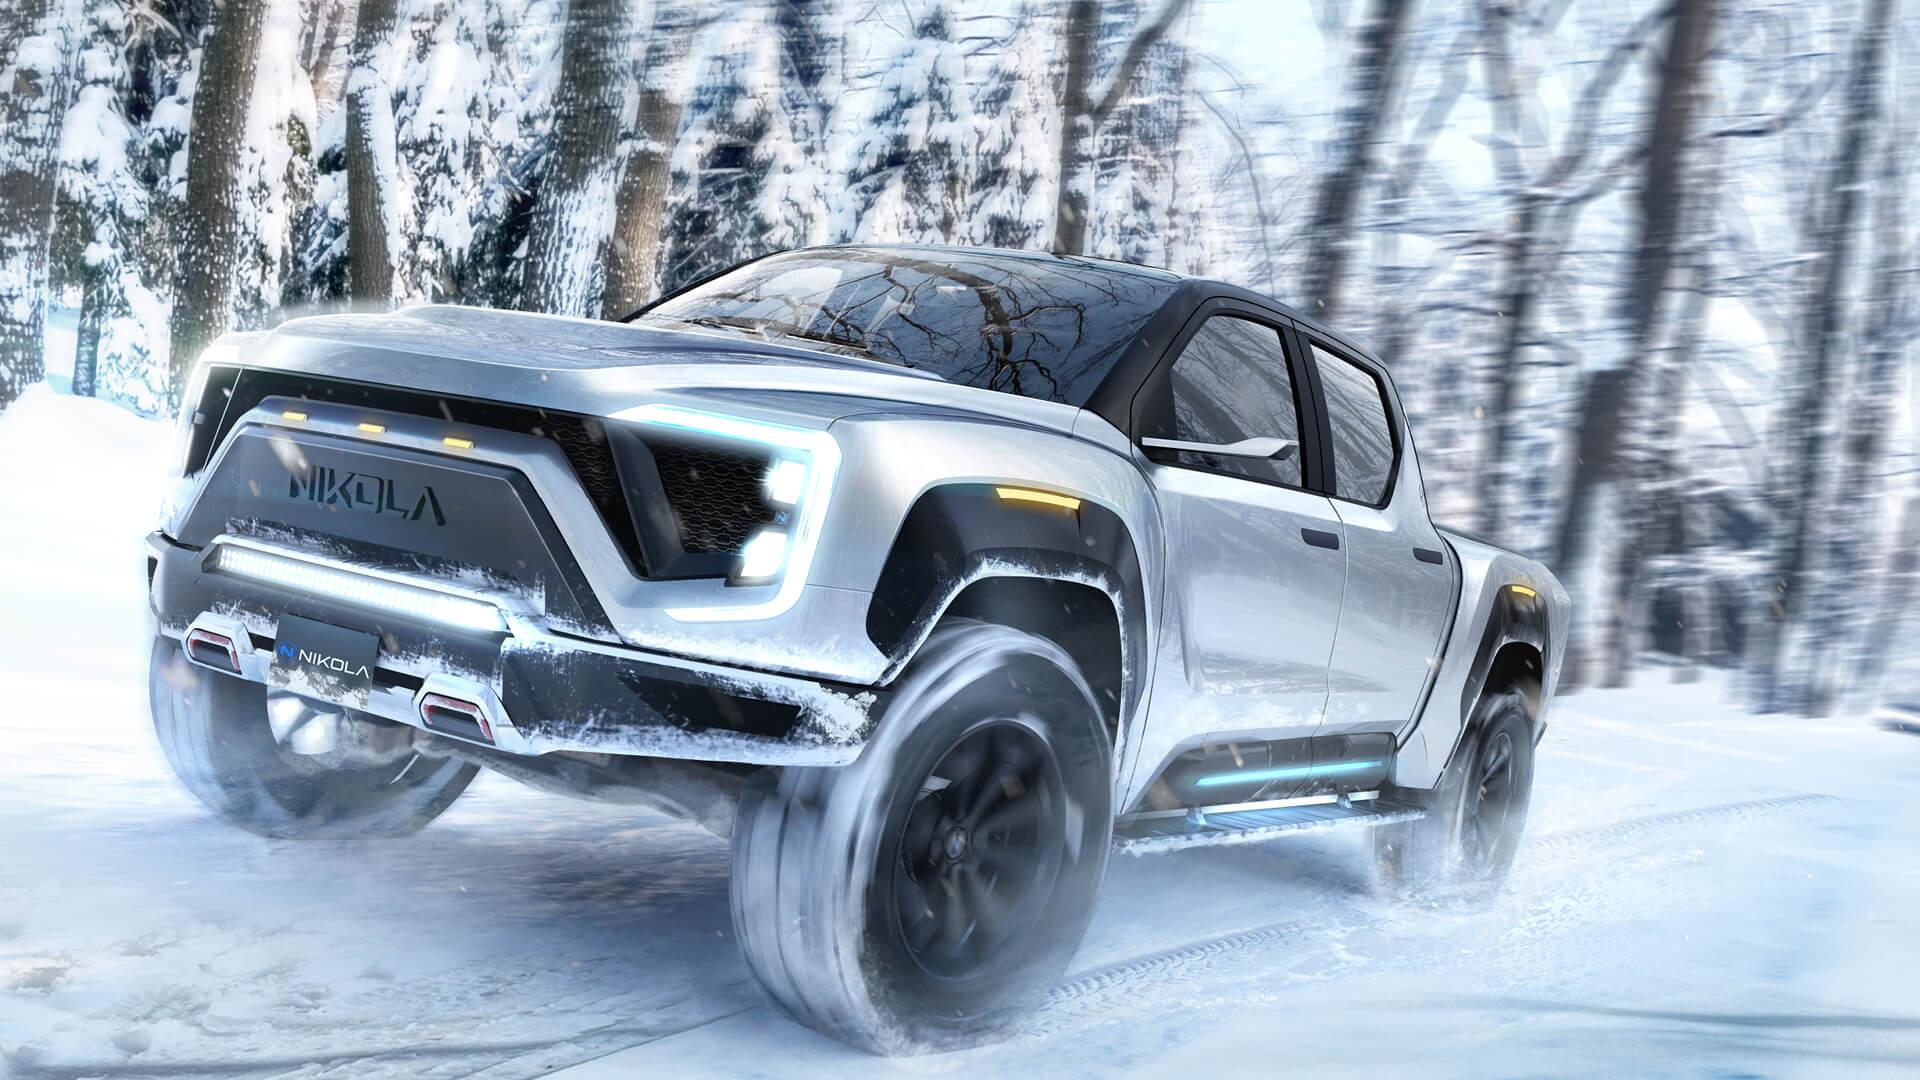 Nikola Badger: 900 HP hydrogen-electric pickup truck with a 600-mile range